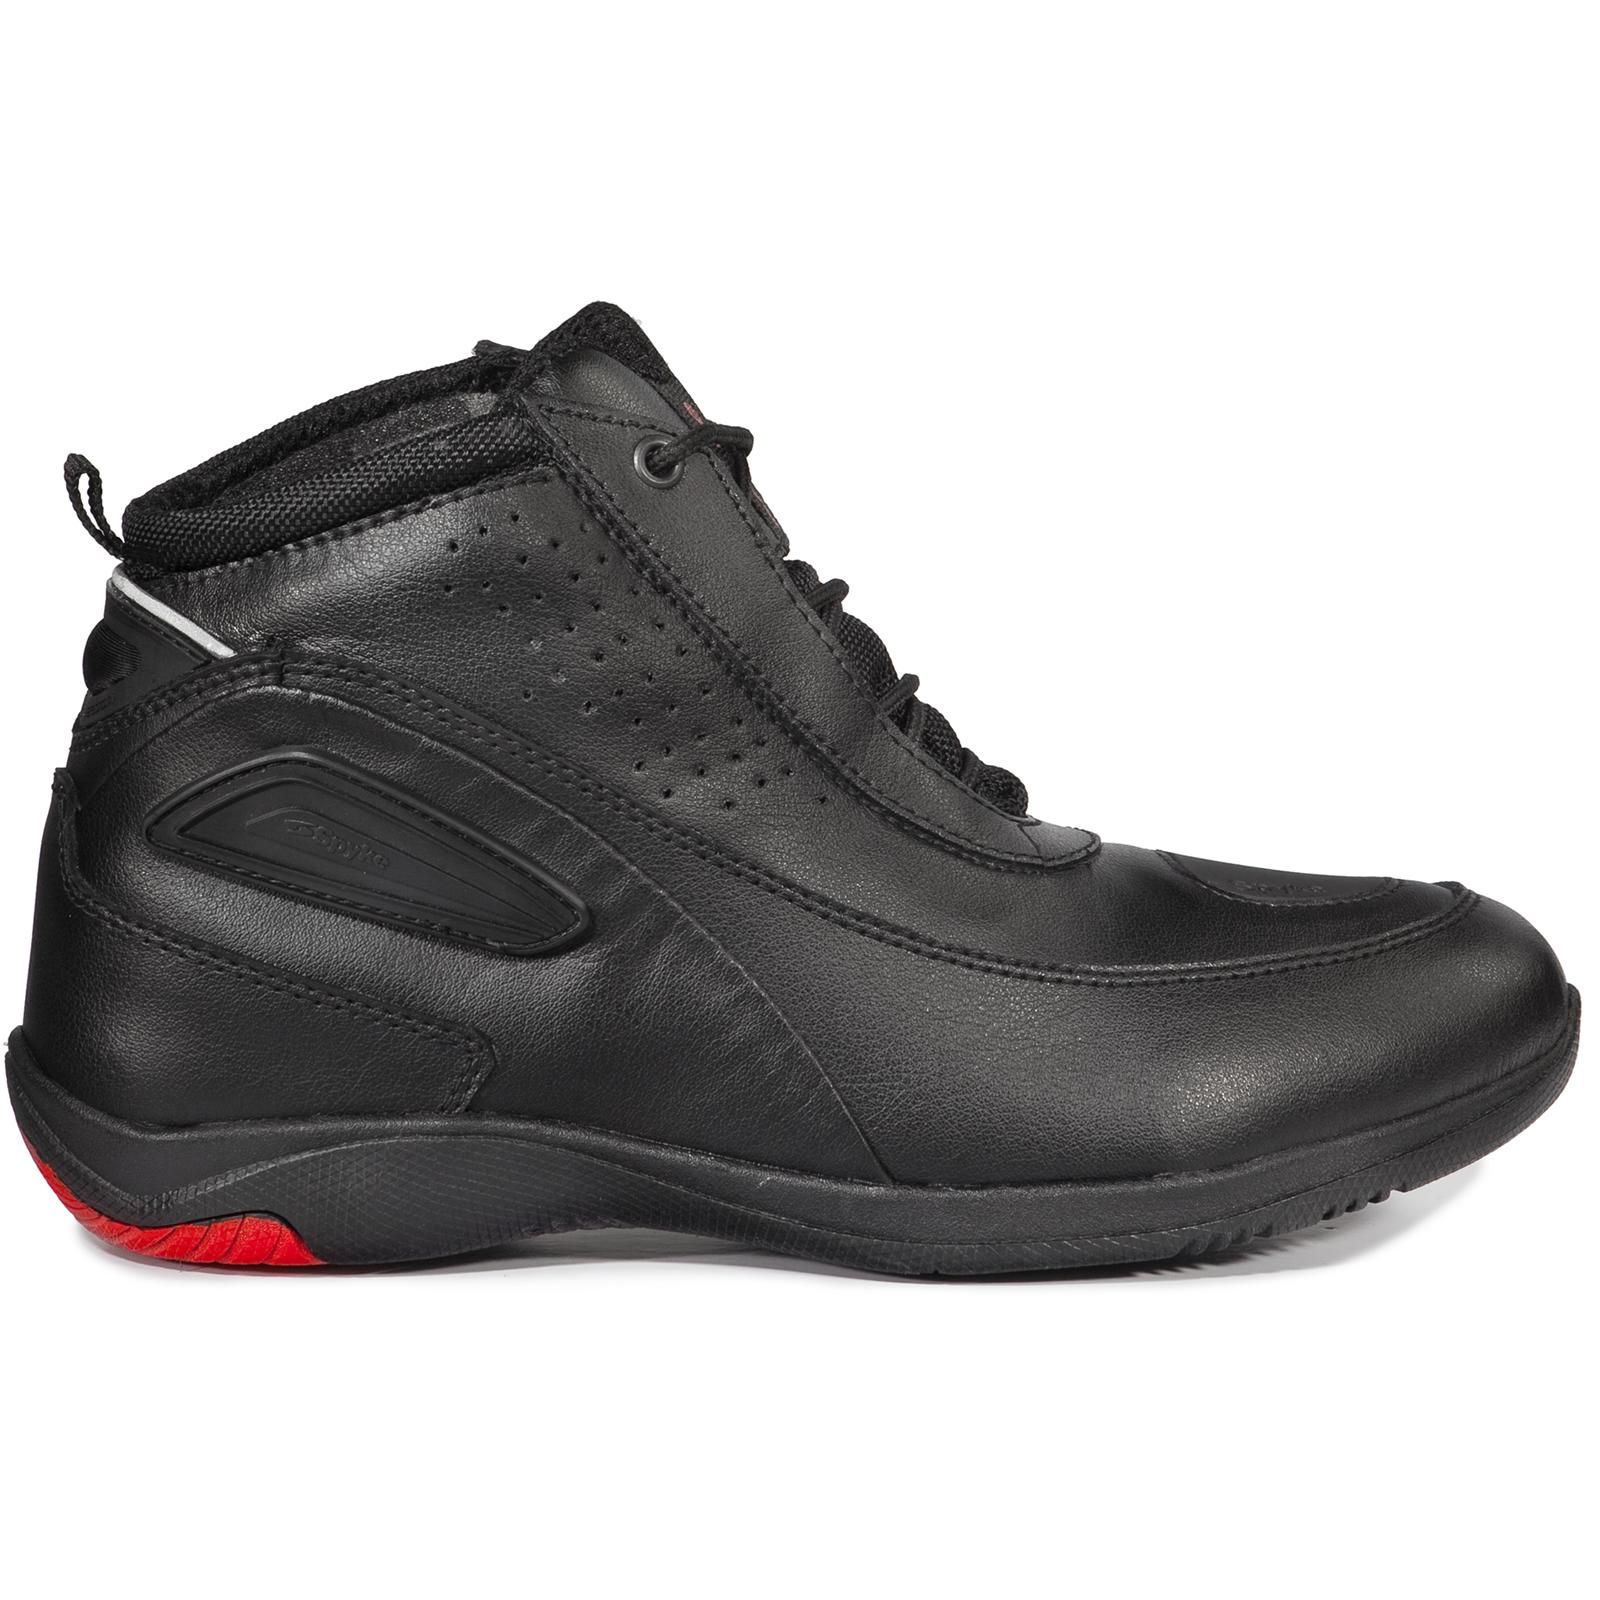 Spyke Urban Mid WP Waterproof Motorcycle Boots Short Ankle Paddock ...